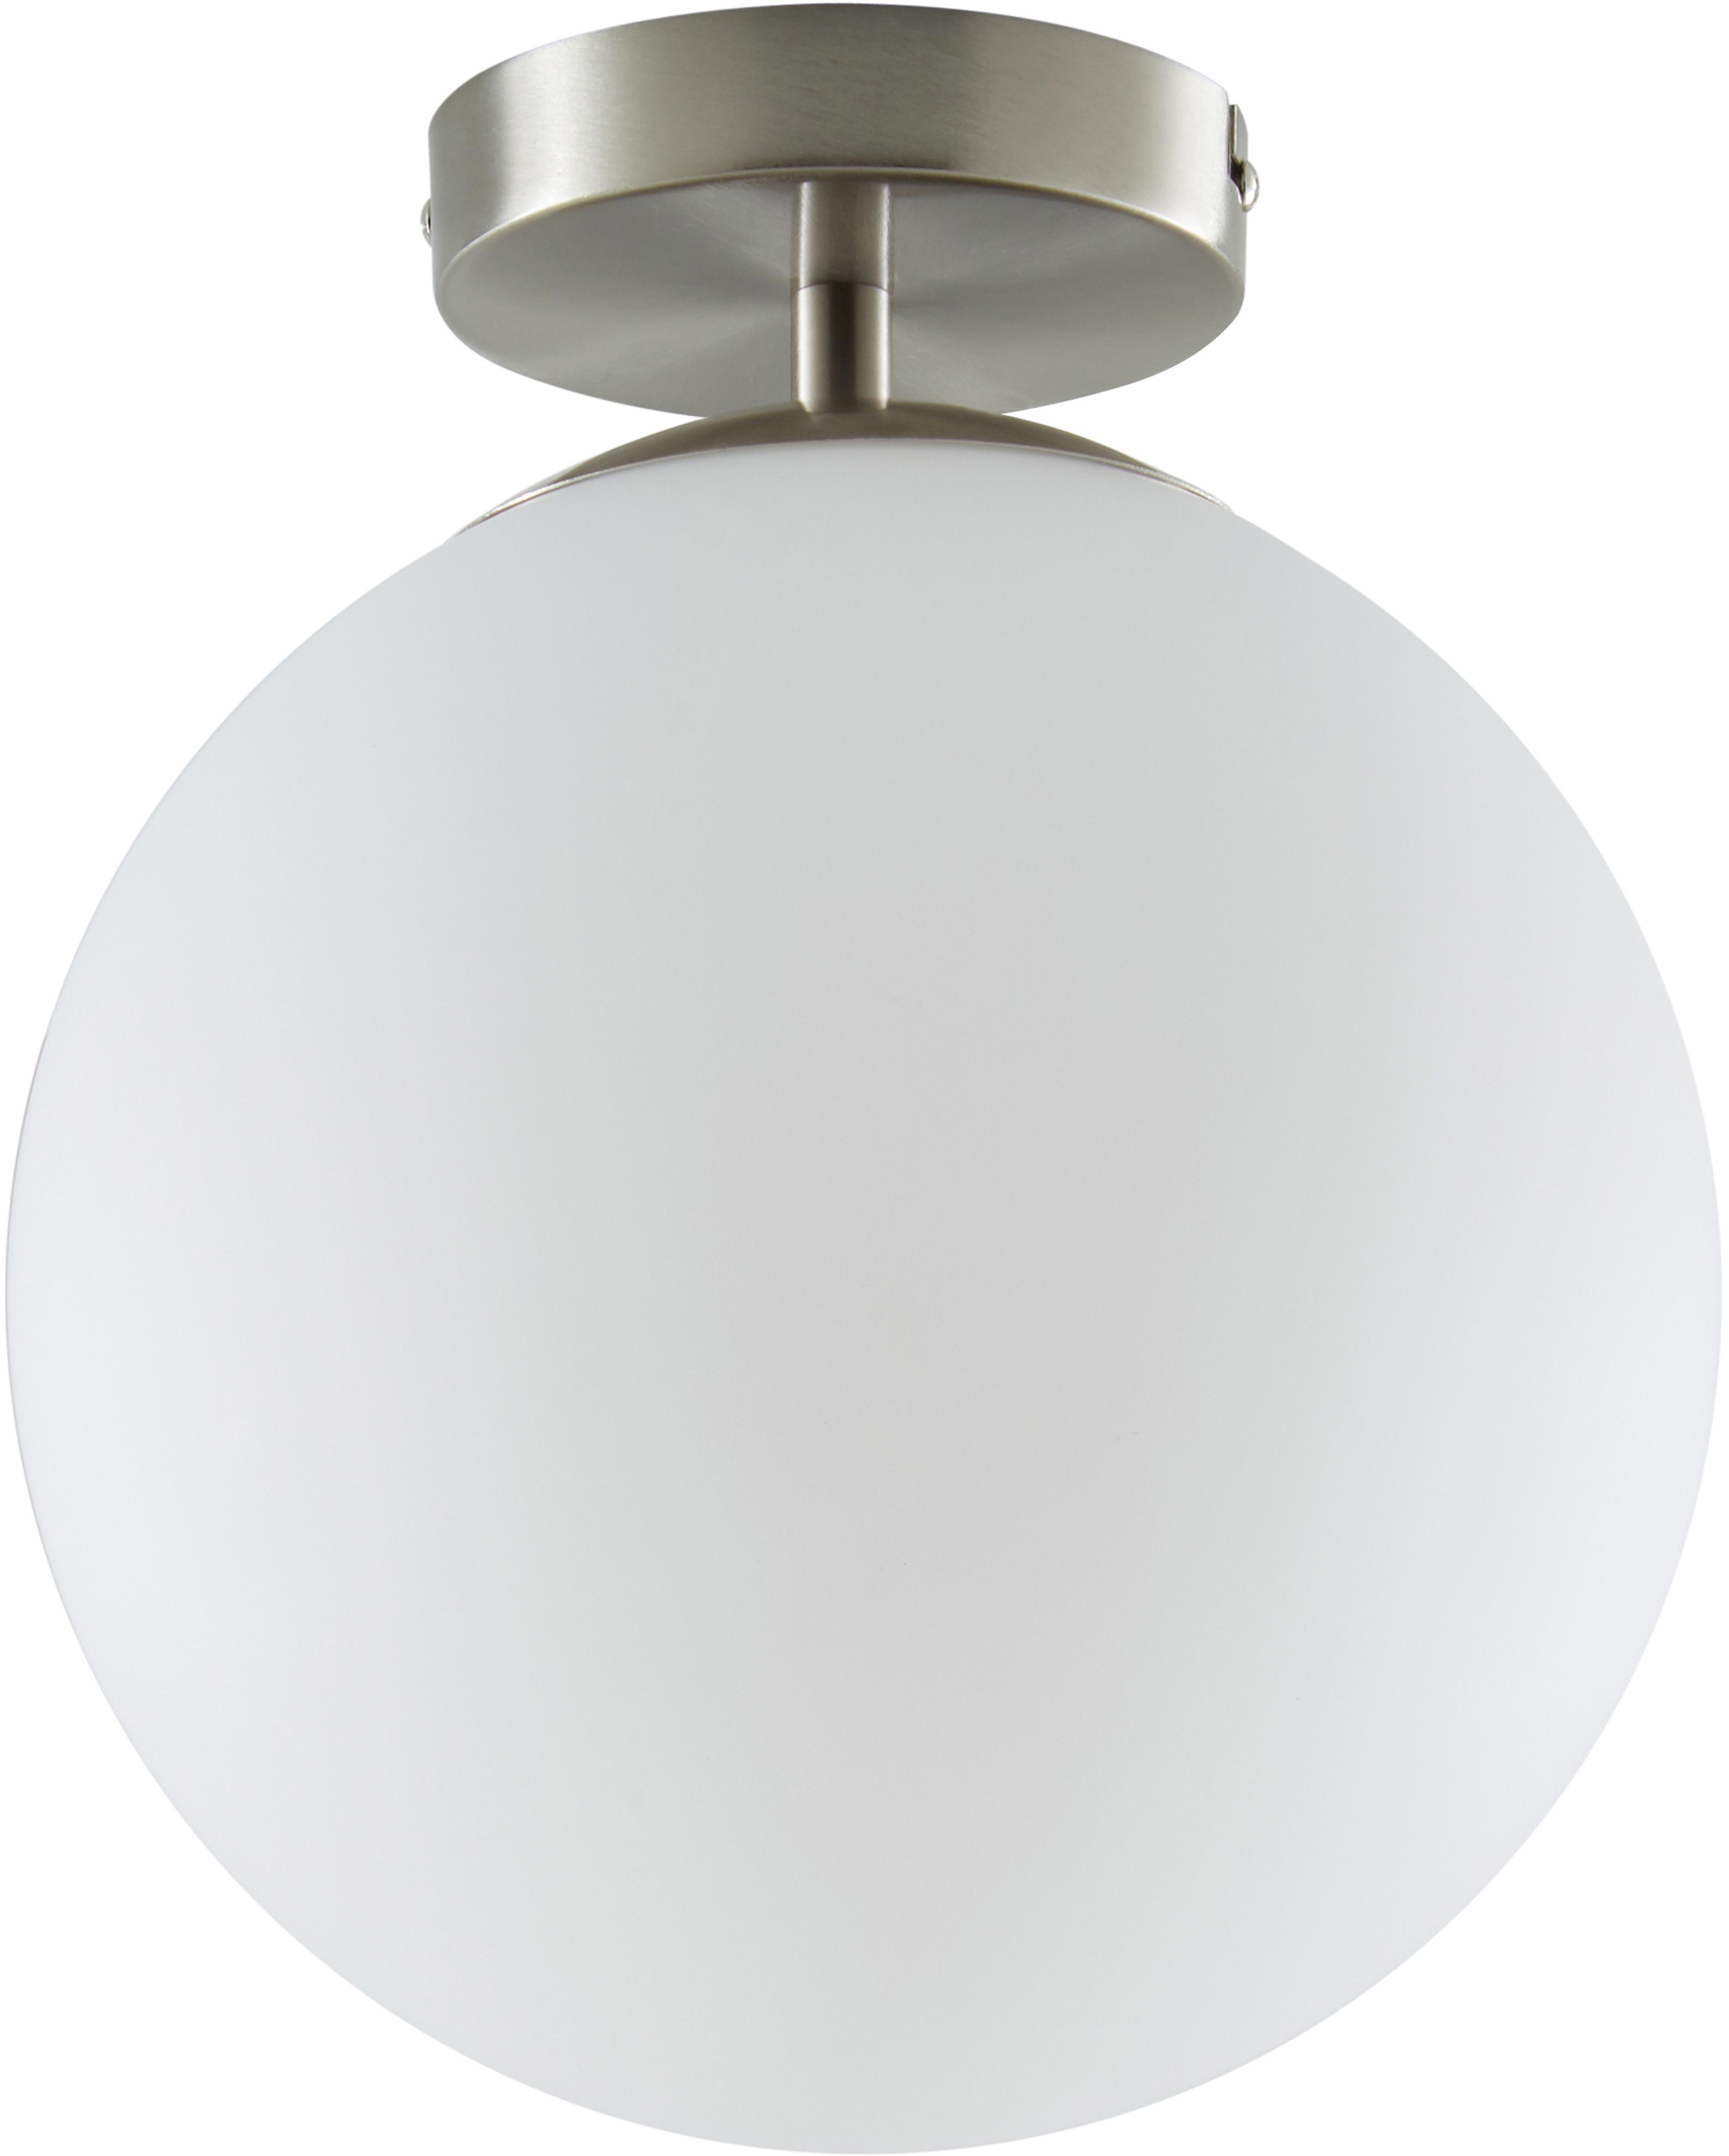 Plafondlamp Hitch, Lampenkap: glas, Baldakijn en fitting: mat zilverkleurig. Lampenkappen: wit, Ø 25 x H 30 cm